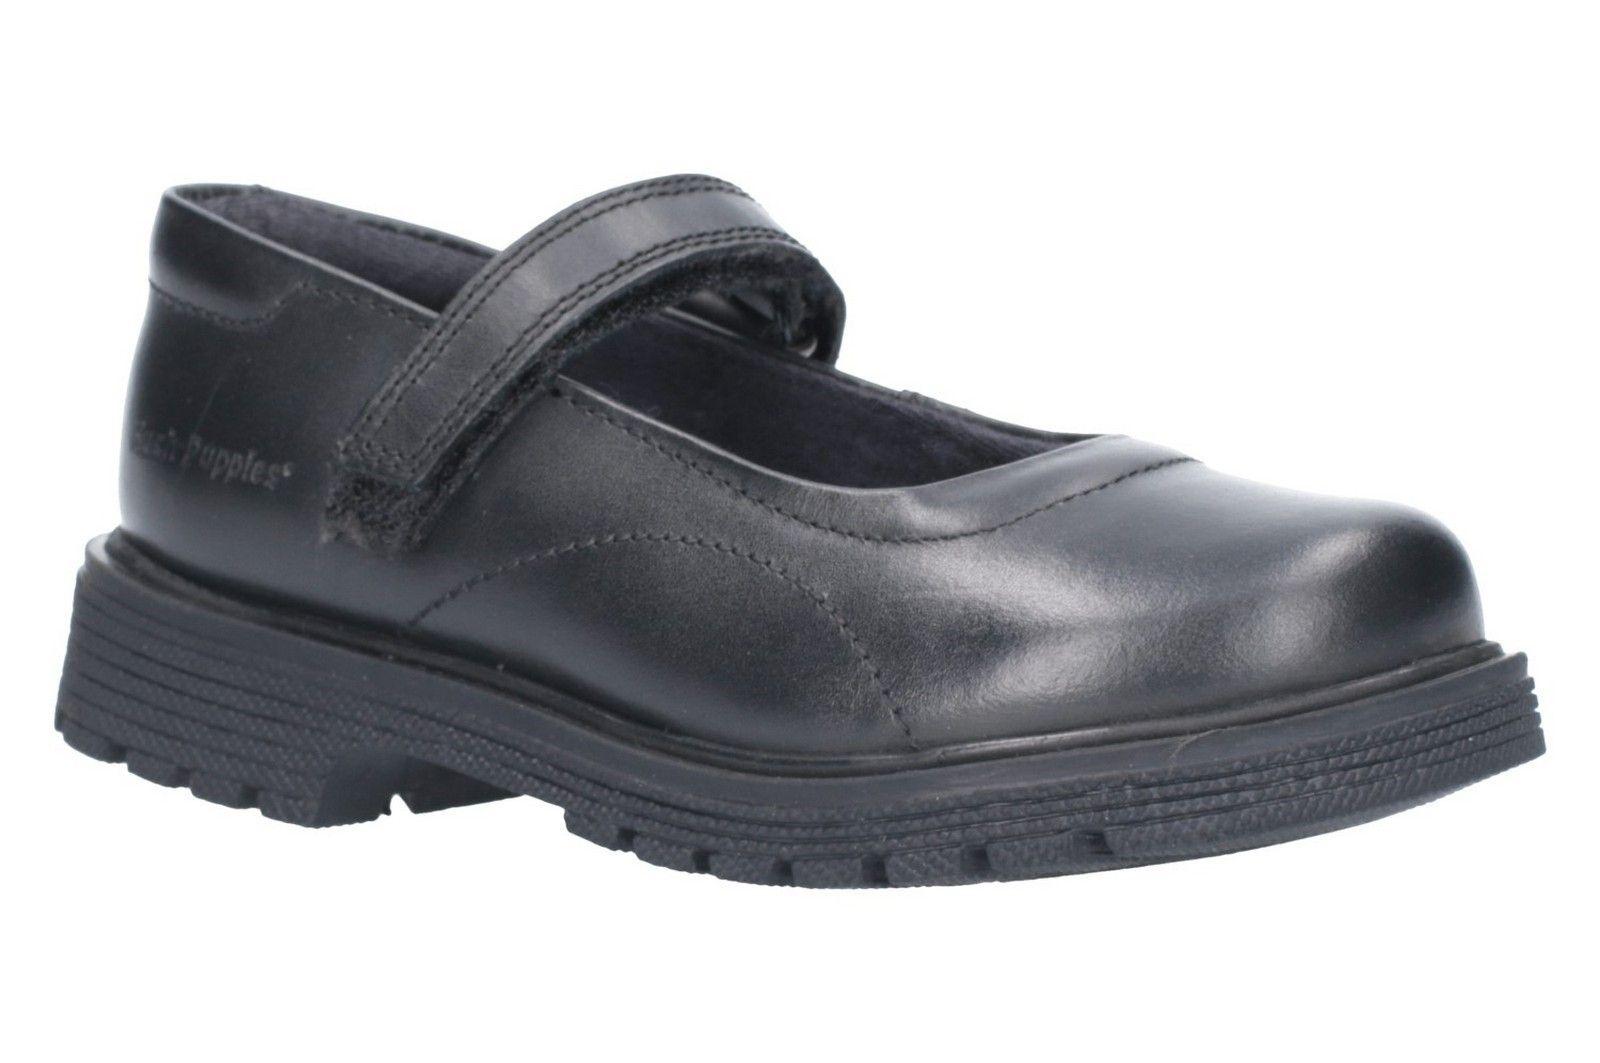 Tally Junior School Shoe